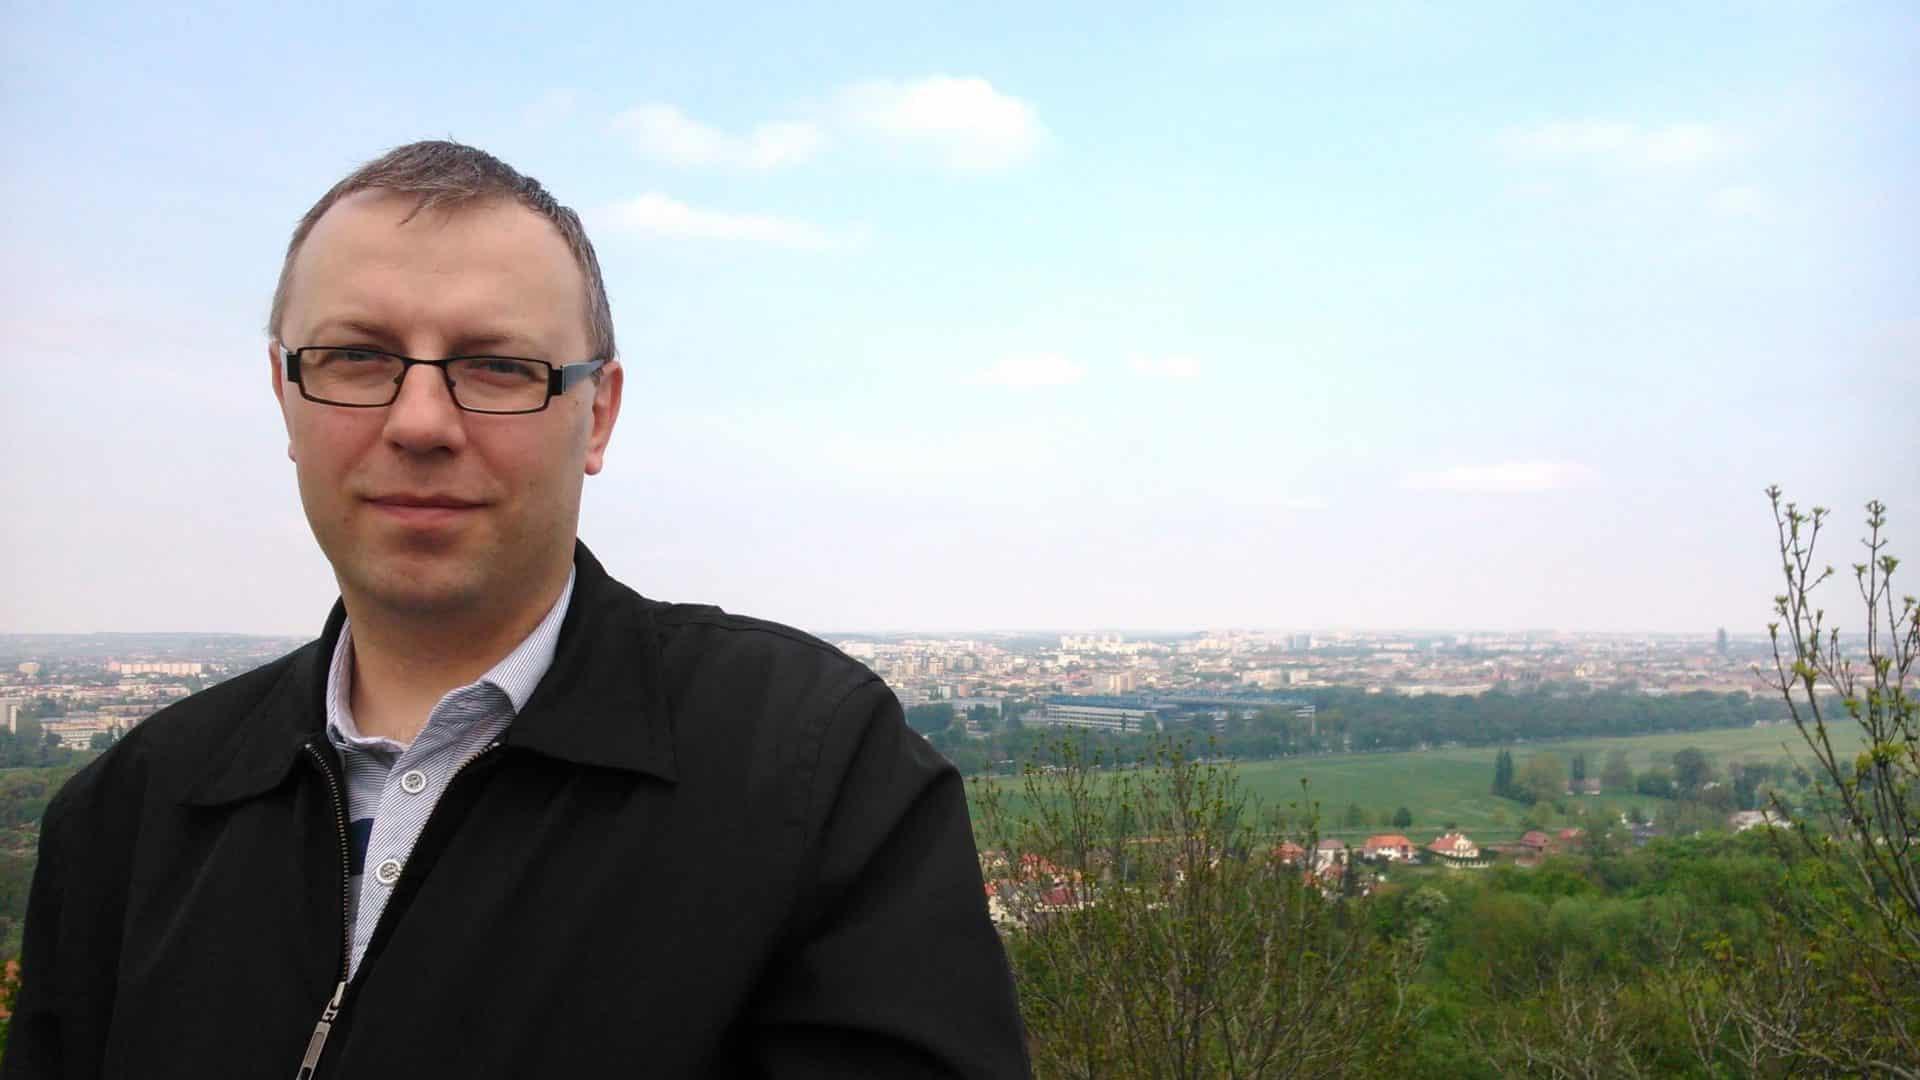 Bartosz Karcz